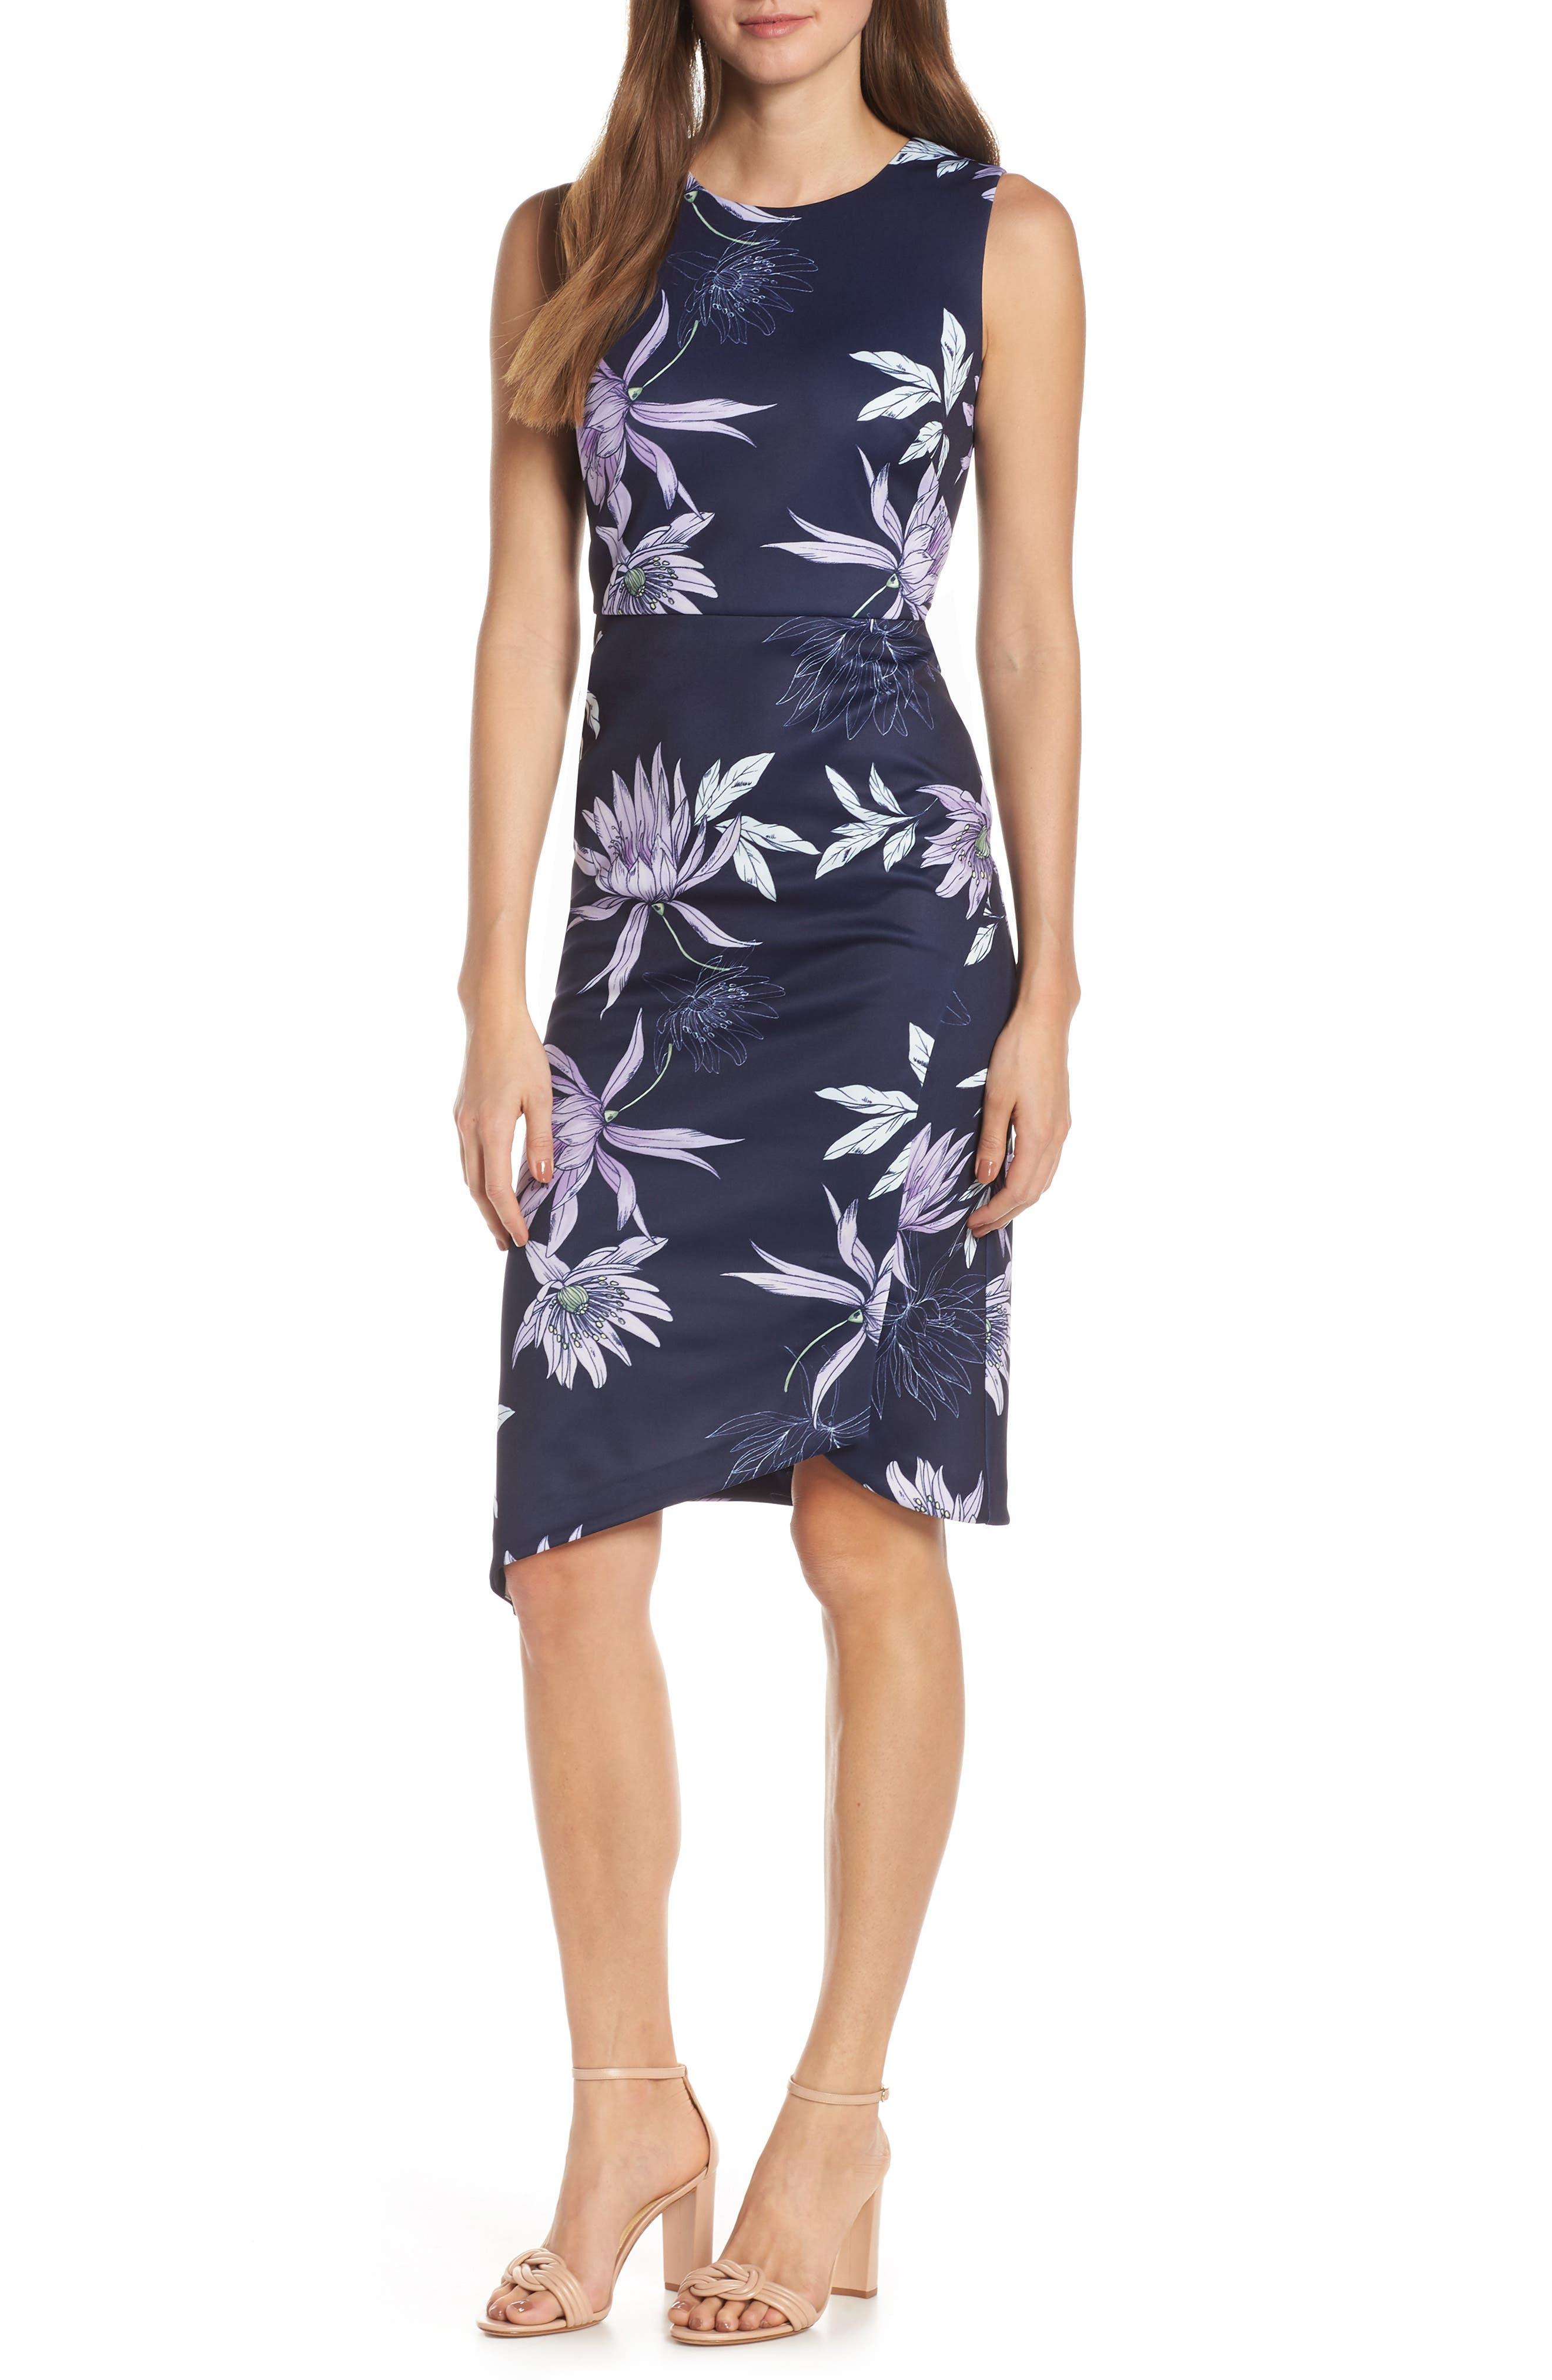 VINCE CAMUTO,                             Floral Print Asymmetrical Hem Dress,                             Main thumbnail 1, color,                             NAVY/ MULTI